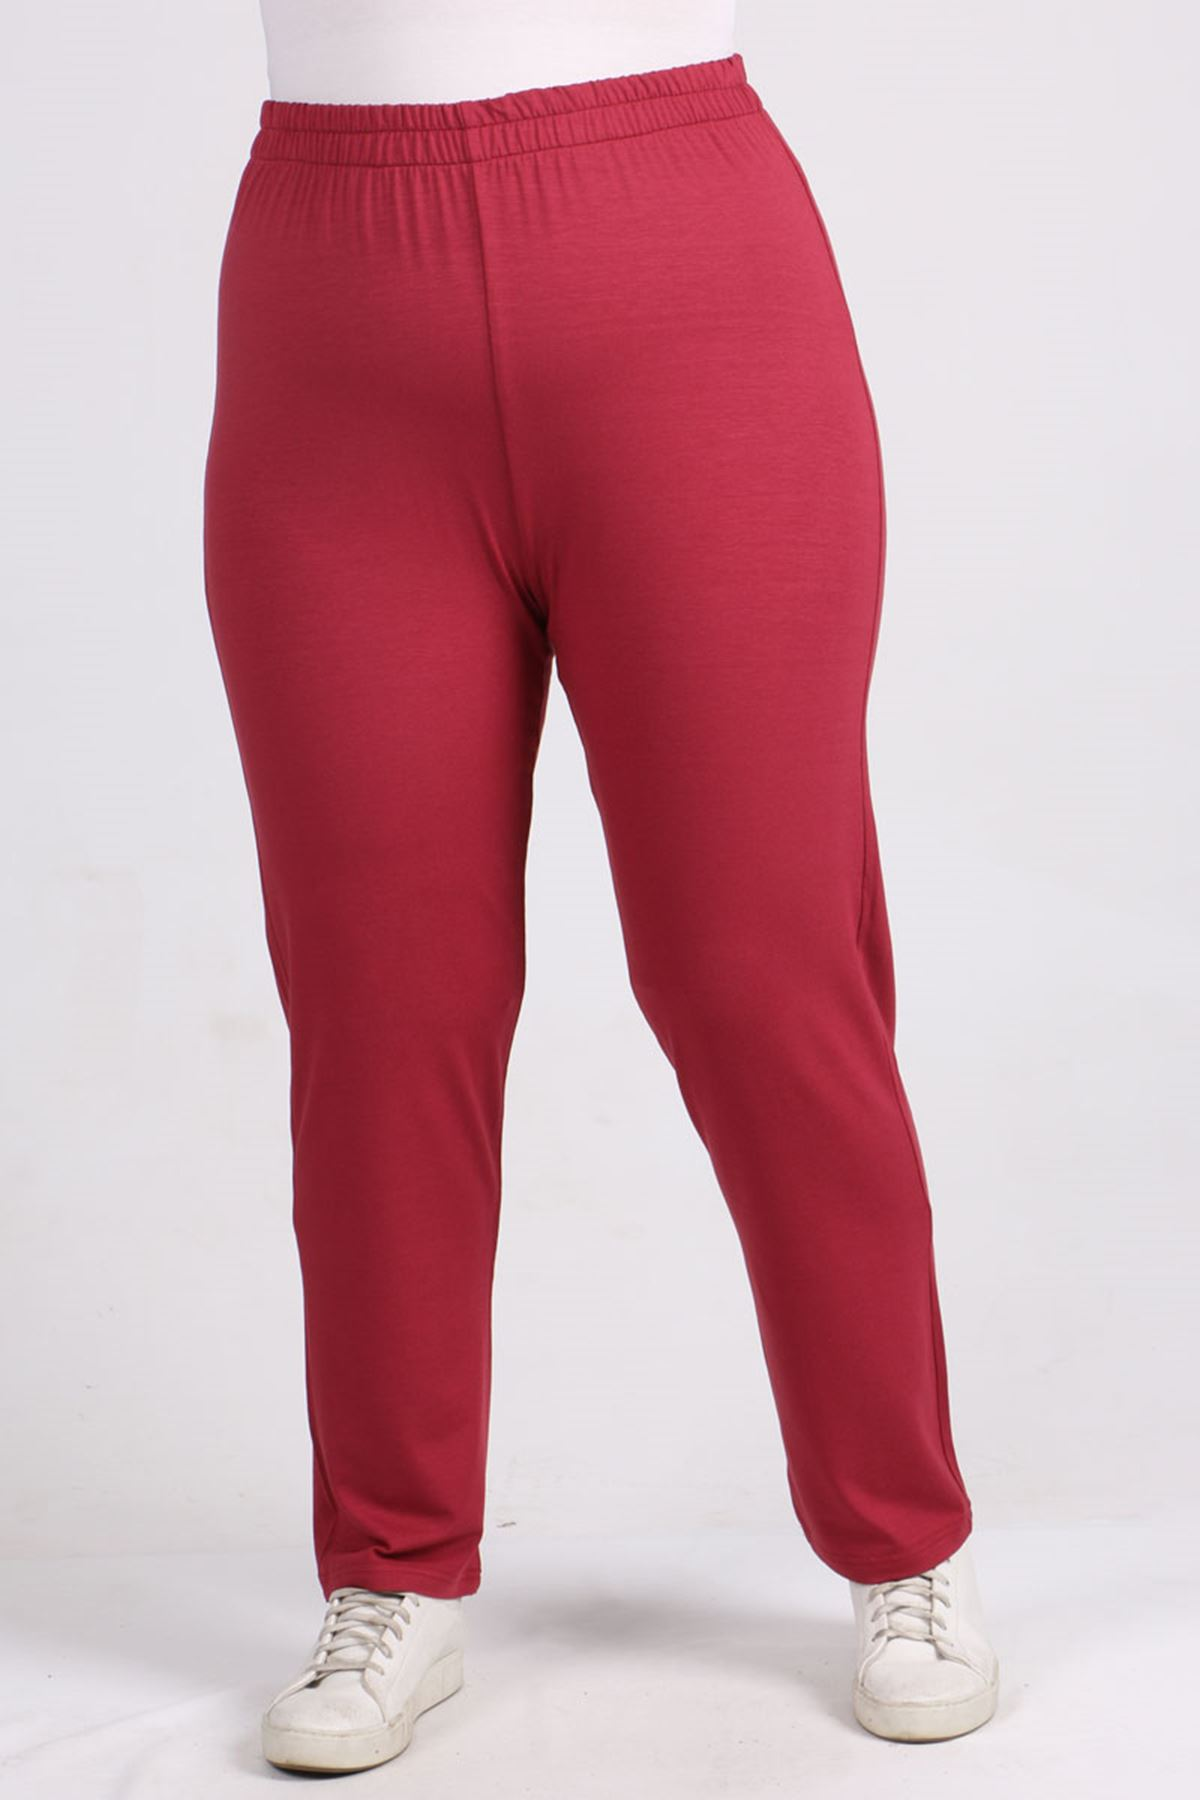 9057 Plus Size High Waist Elastic Pants - Dark Rose